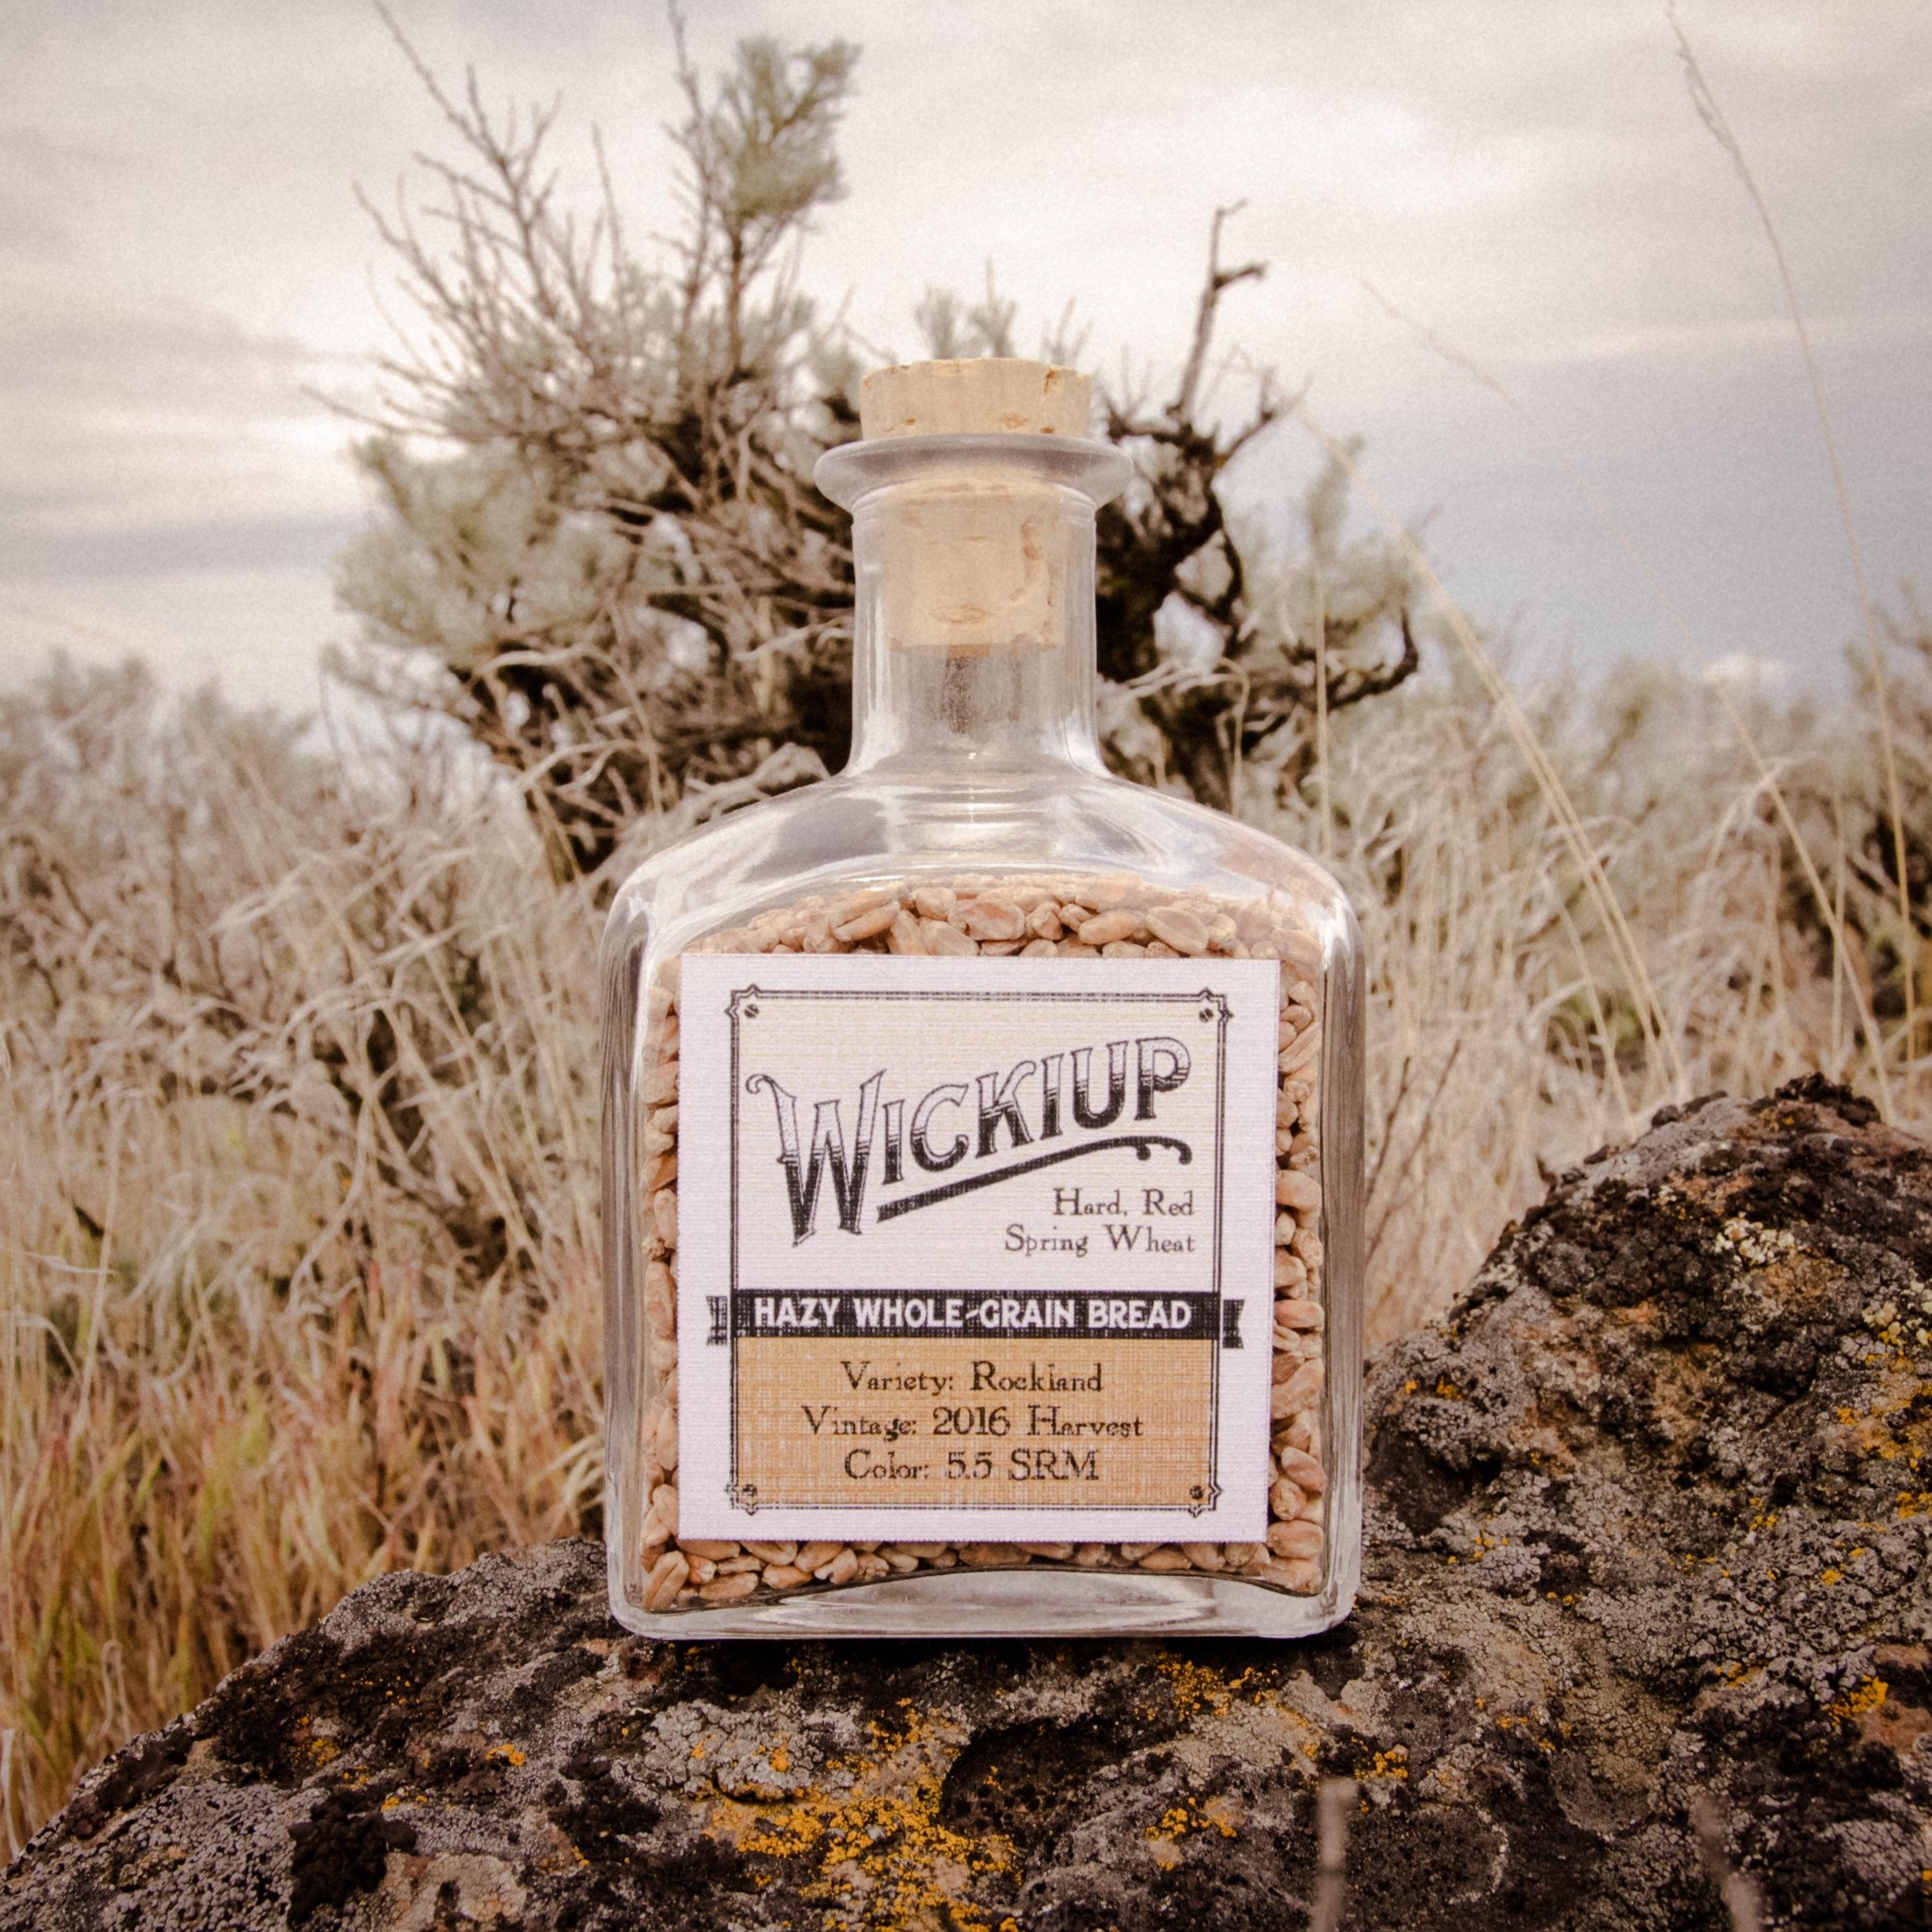 Wickiup Hard Red Spring Wheat from Mecca Grade Estate Malt in Madras Oregon